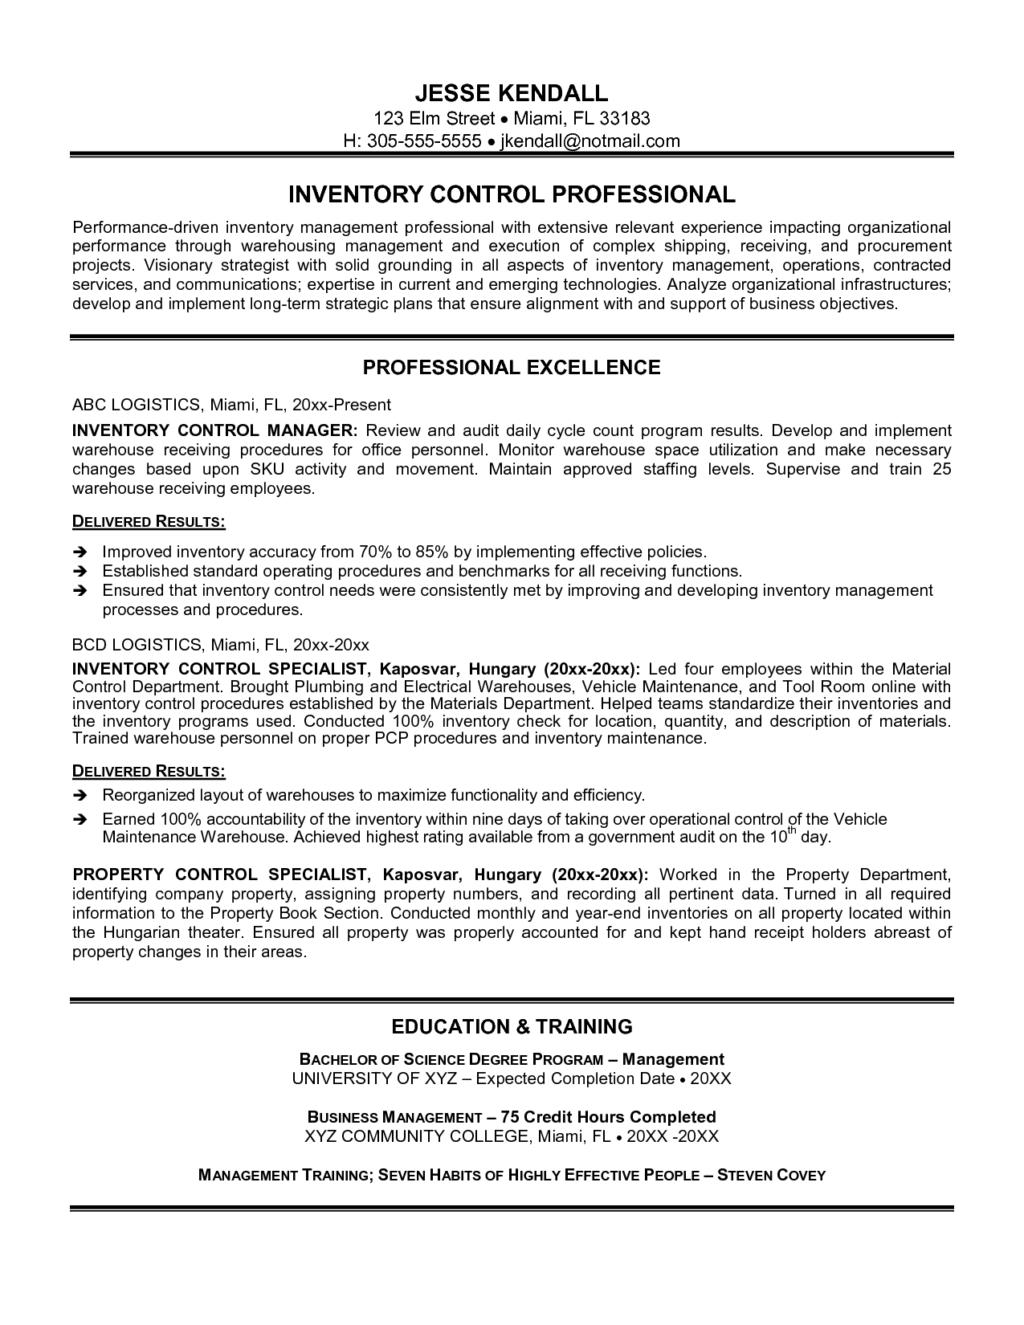 Pin by Brenda's Pins on resume sample Sample resume, Job